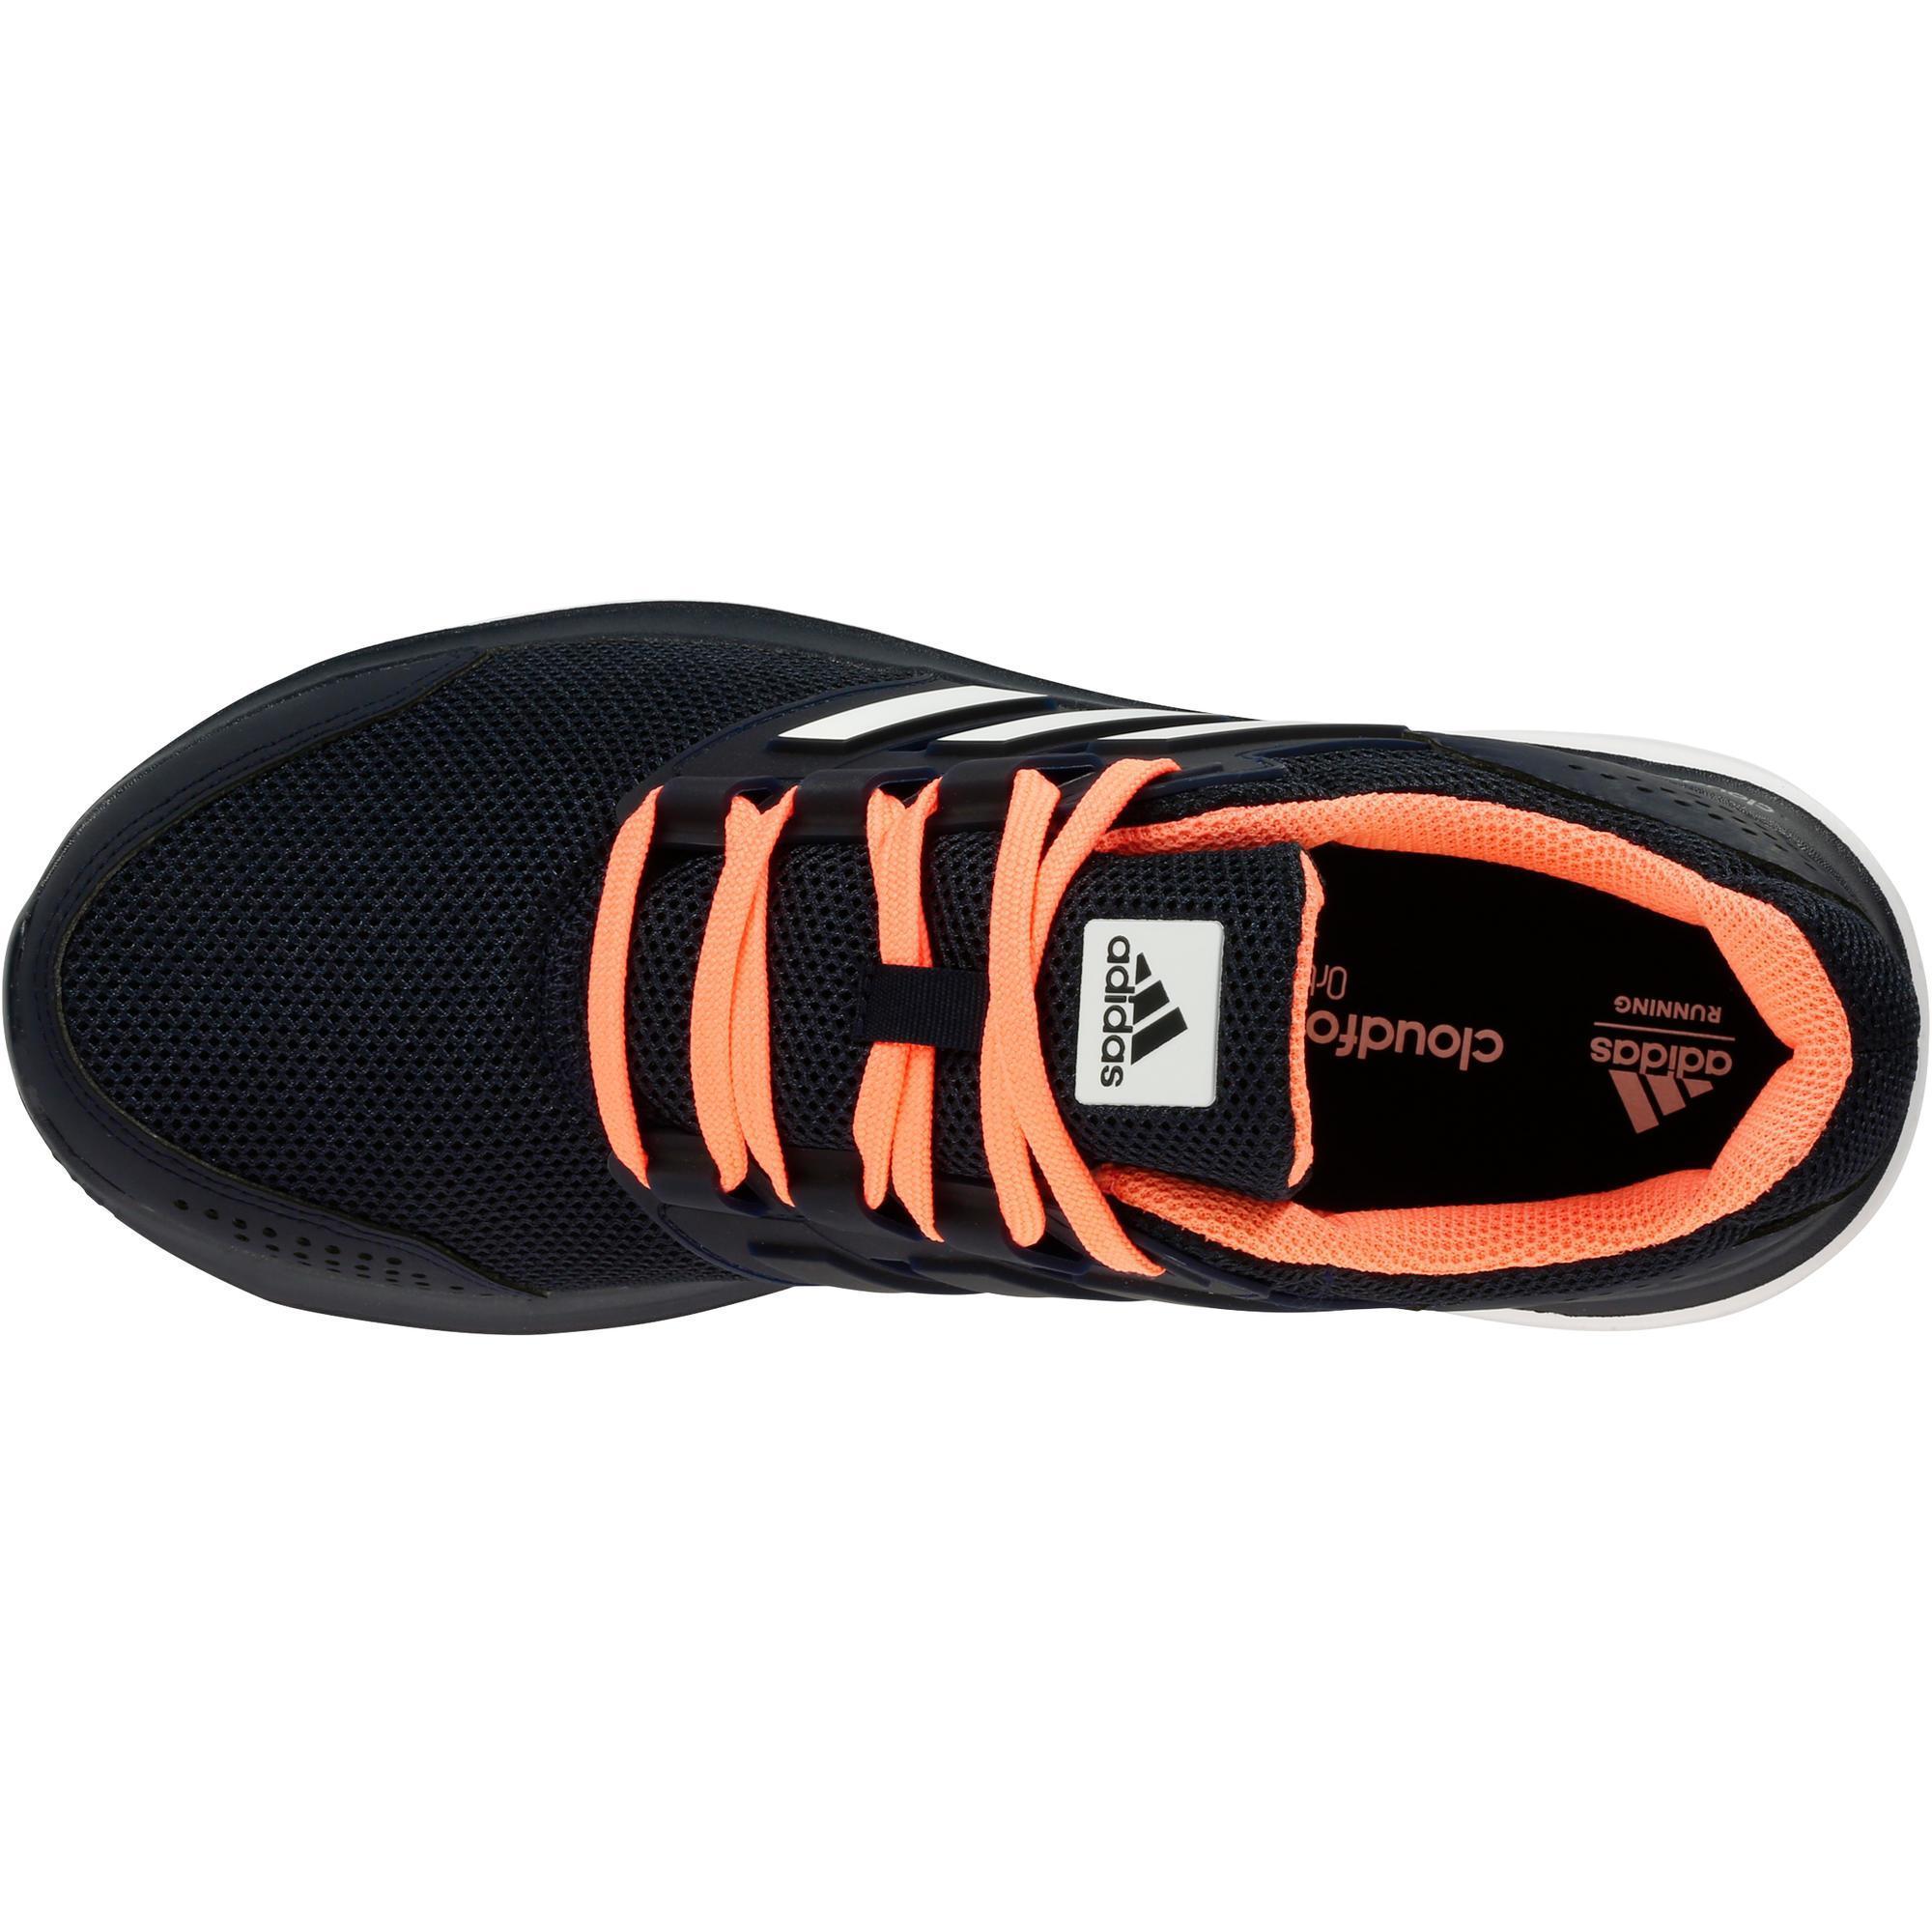 a2c31c39ba5 Course 4 Galaxy Pied A Jogging Adidas Gnnvp Noir Femme Chaussures Pq7B4I